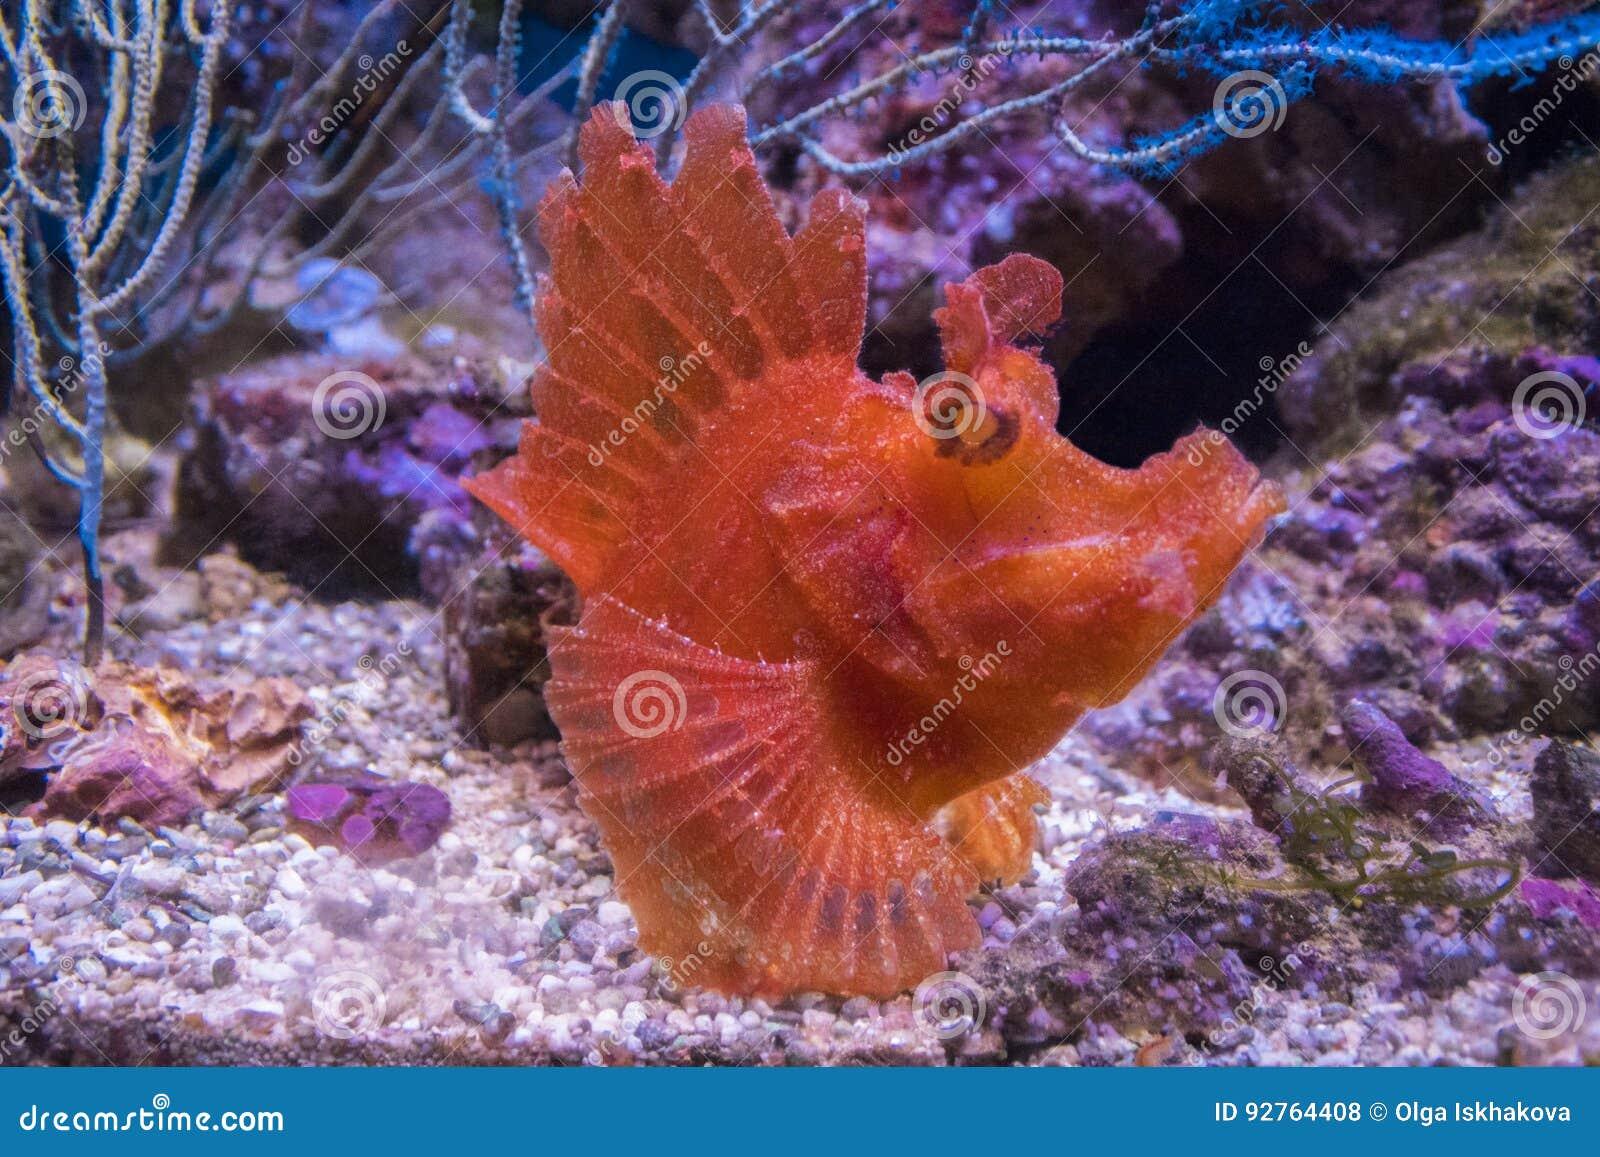 Rhinopias eschmeyeri. Shaggy fish-angler.